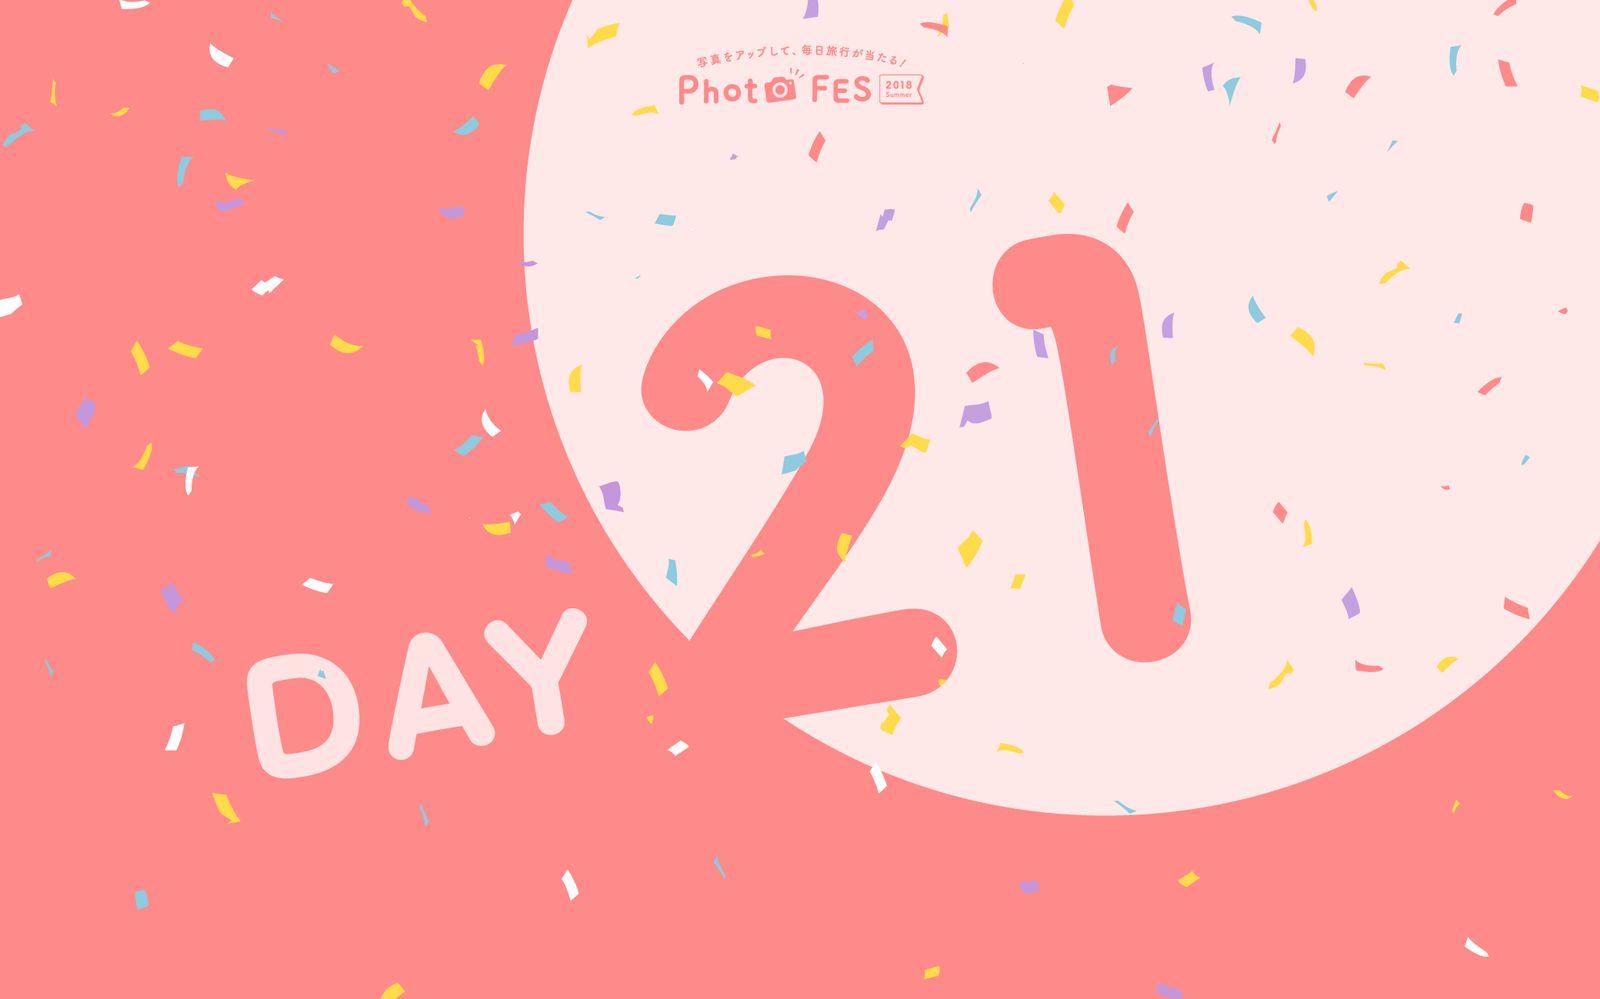 【DAY21】「Photo FES 2018」7月16日投稿分であたる賞品&受賞者発表